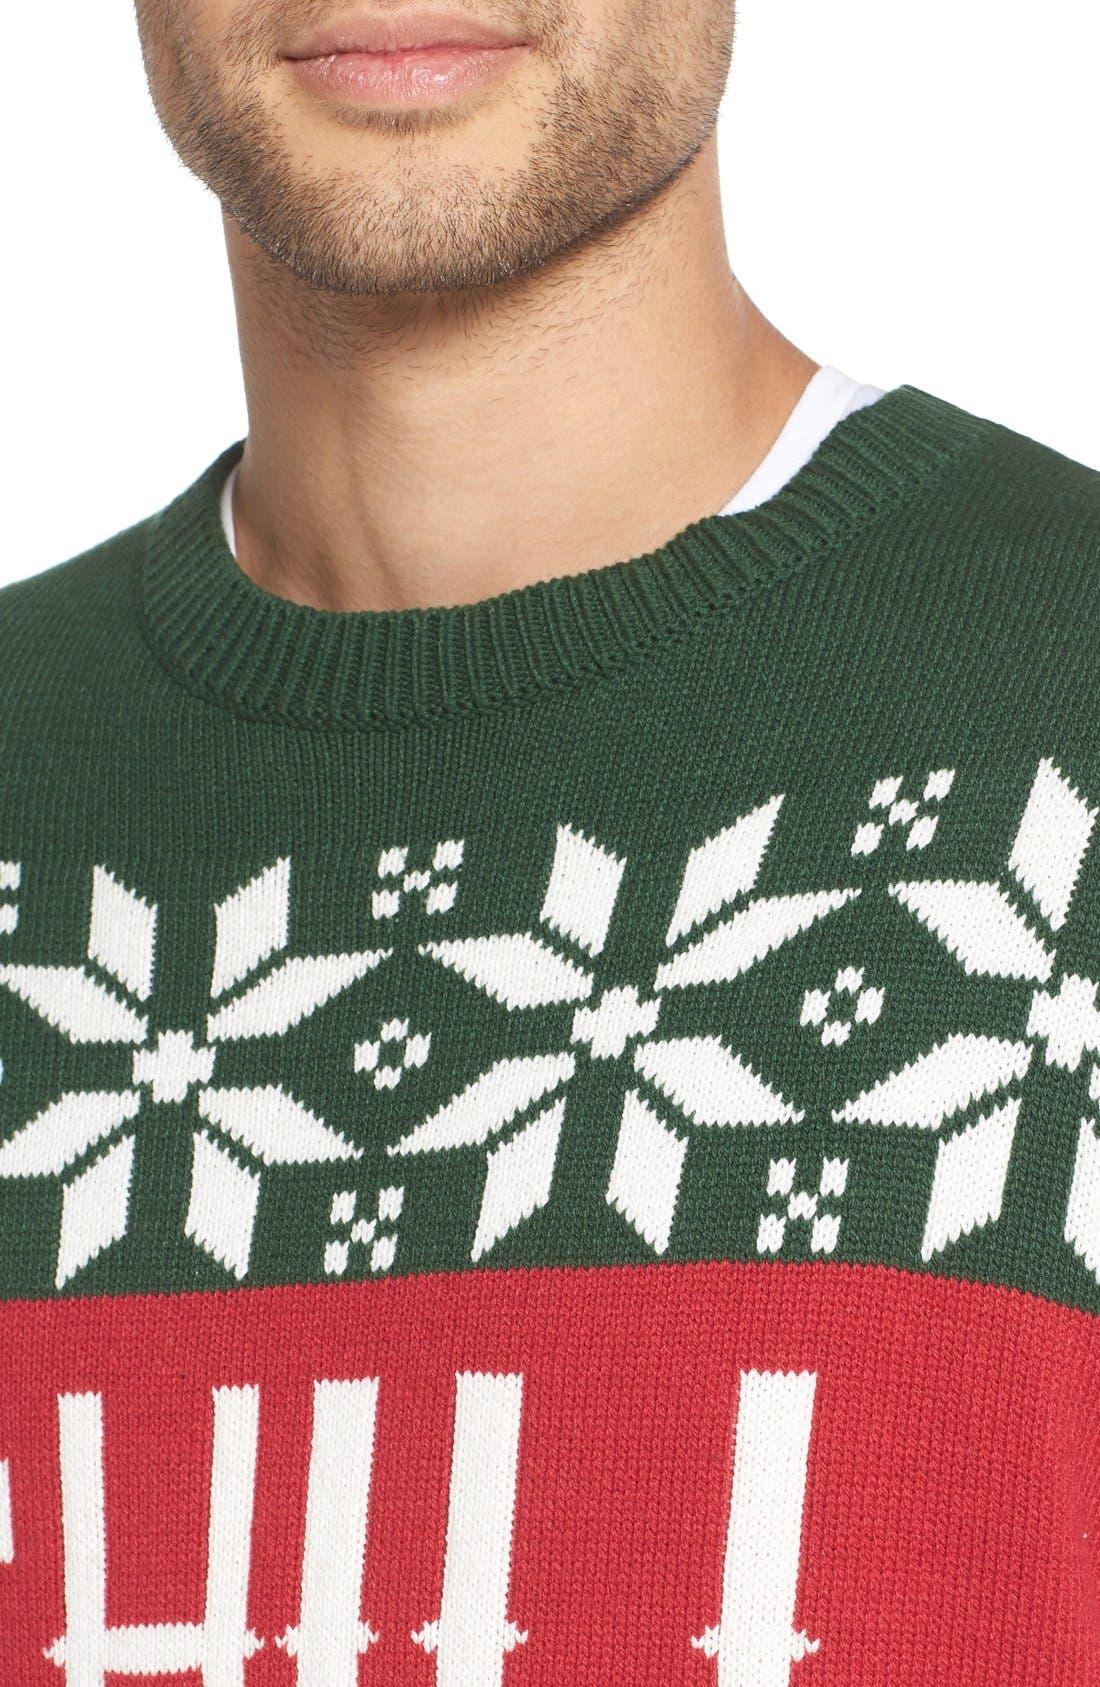 'Chill Vibes' Intarsia Crewneck Sweater,                             Alternate thumbnail 4, color,                             641